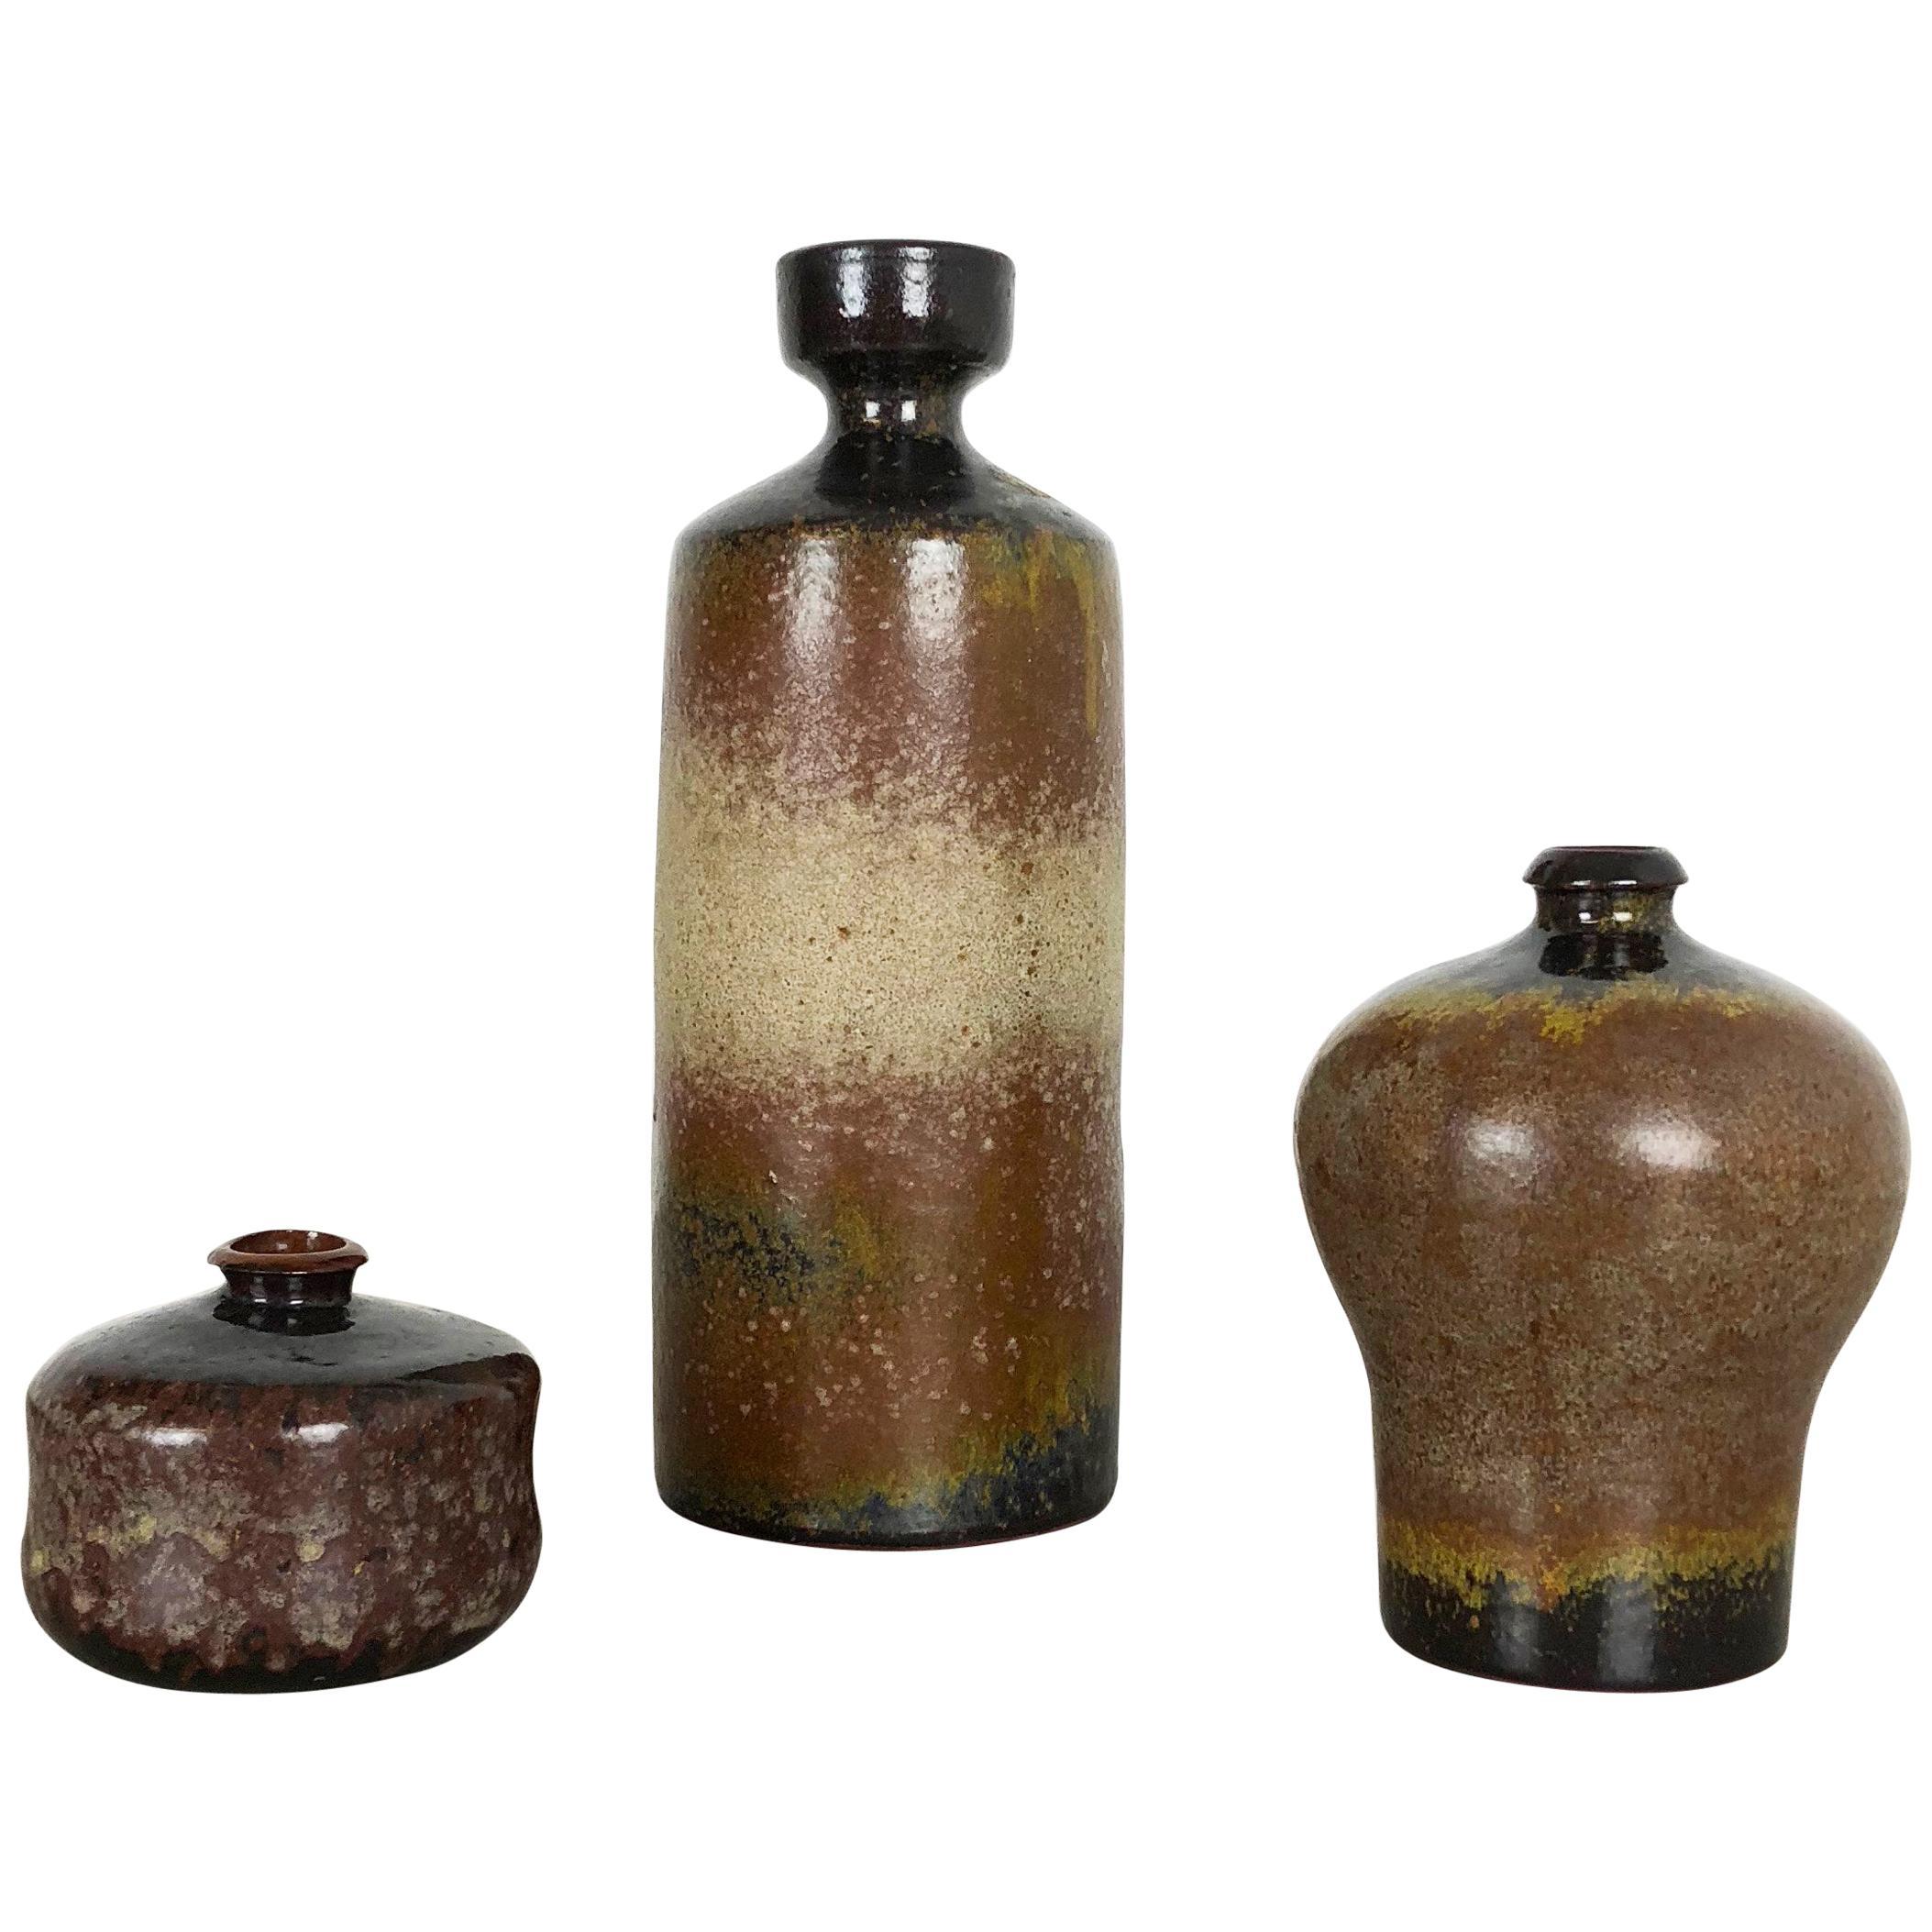 Set of 3 Ceramic Studio Pottery Vase by Elmar and Elke Kubicek, Germany, 1970